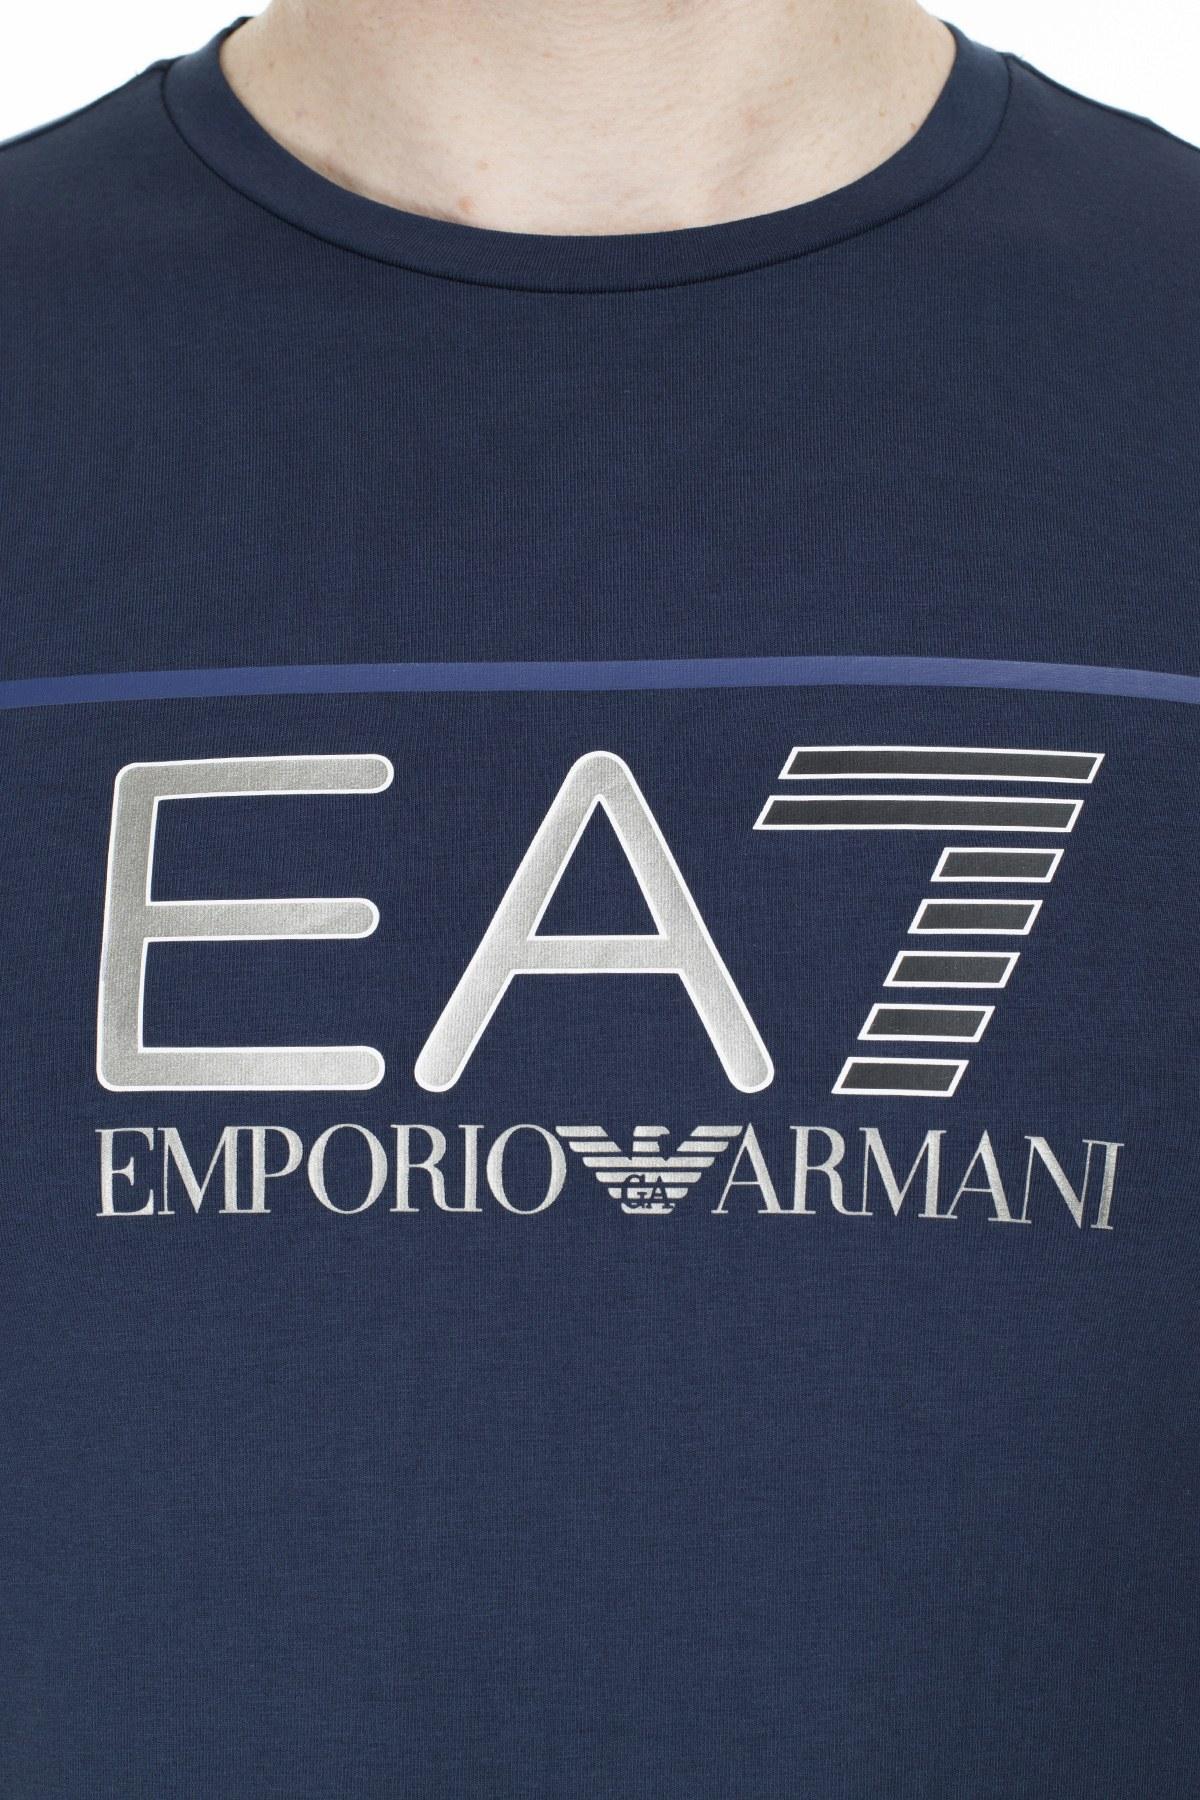 EA7 Regular Fit Erkek T Shirt S 6GPT09 PJ20Z 1554 LACİVERT